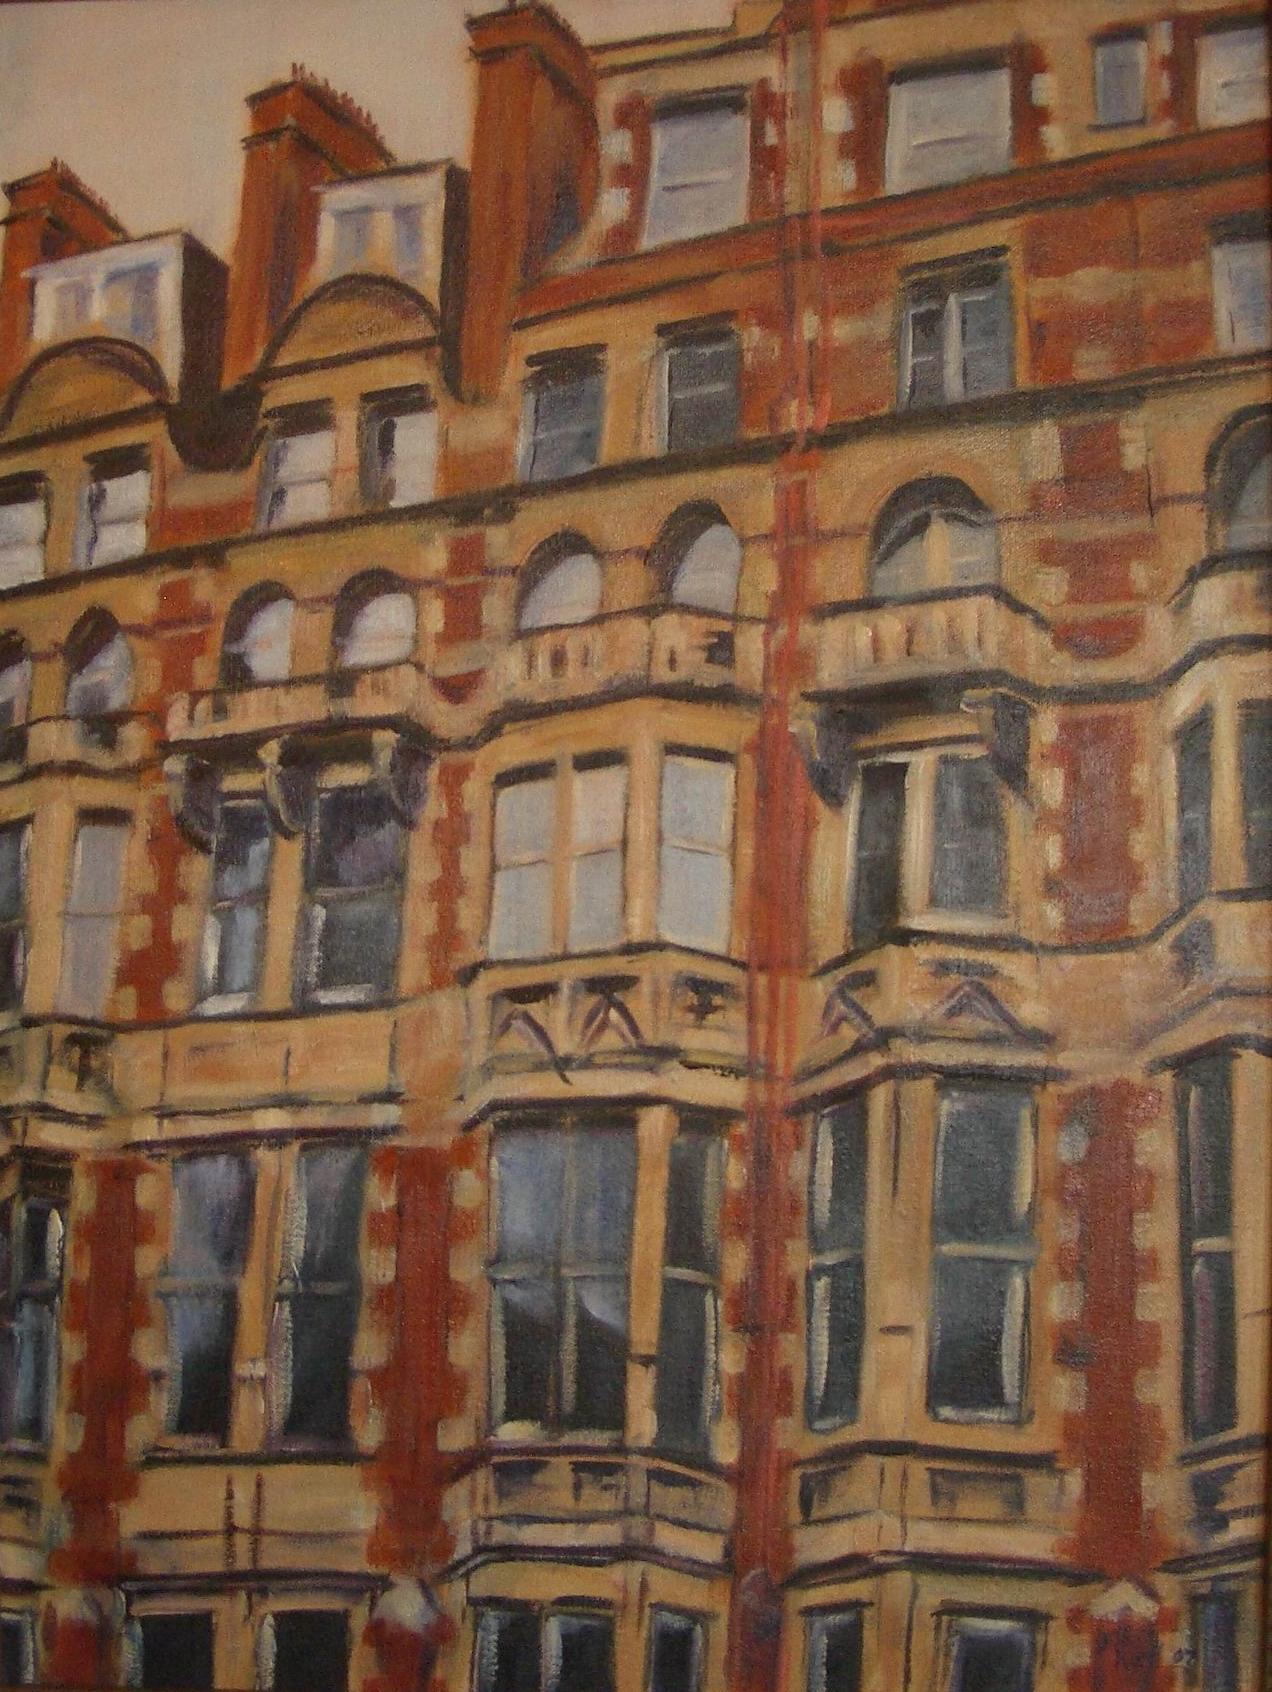 London Windows - 30x24